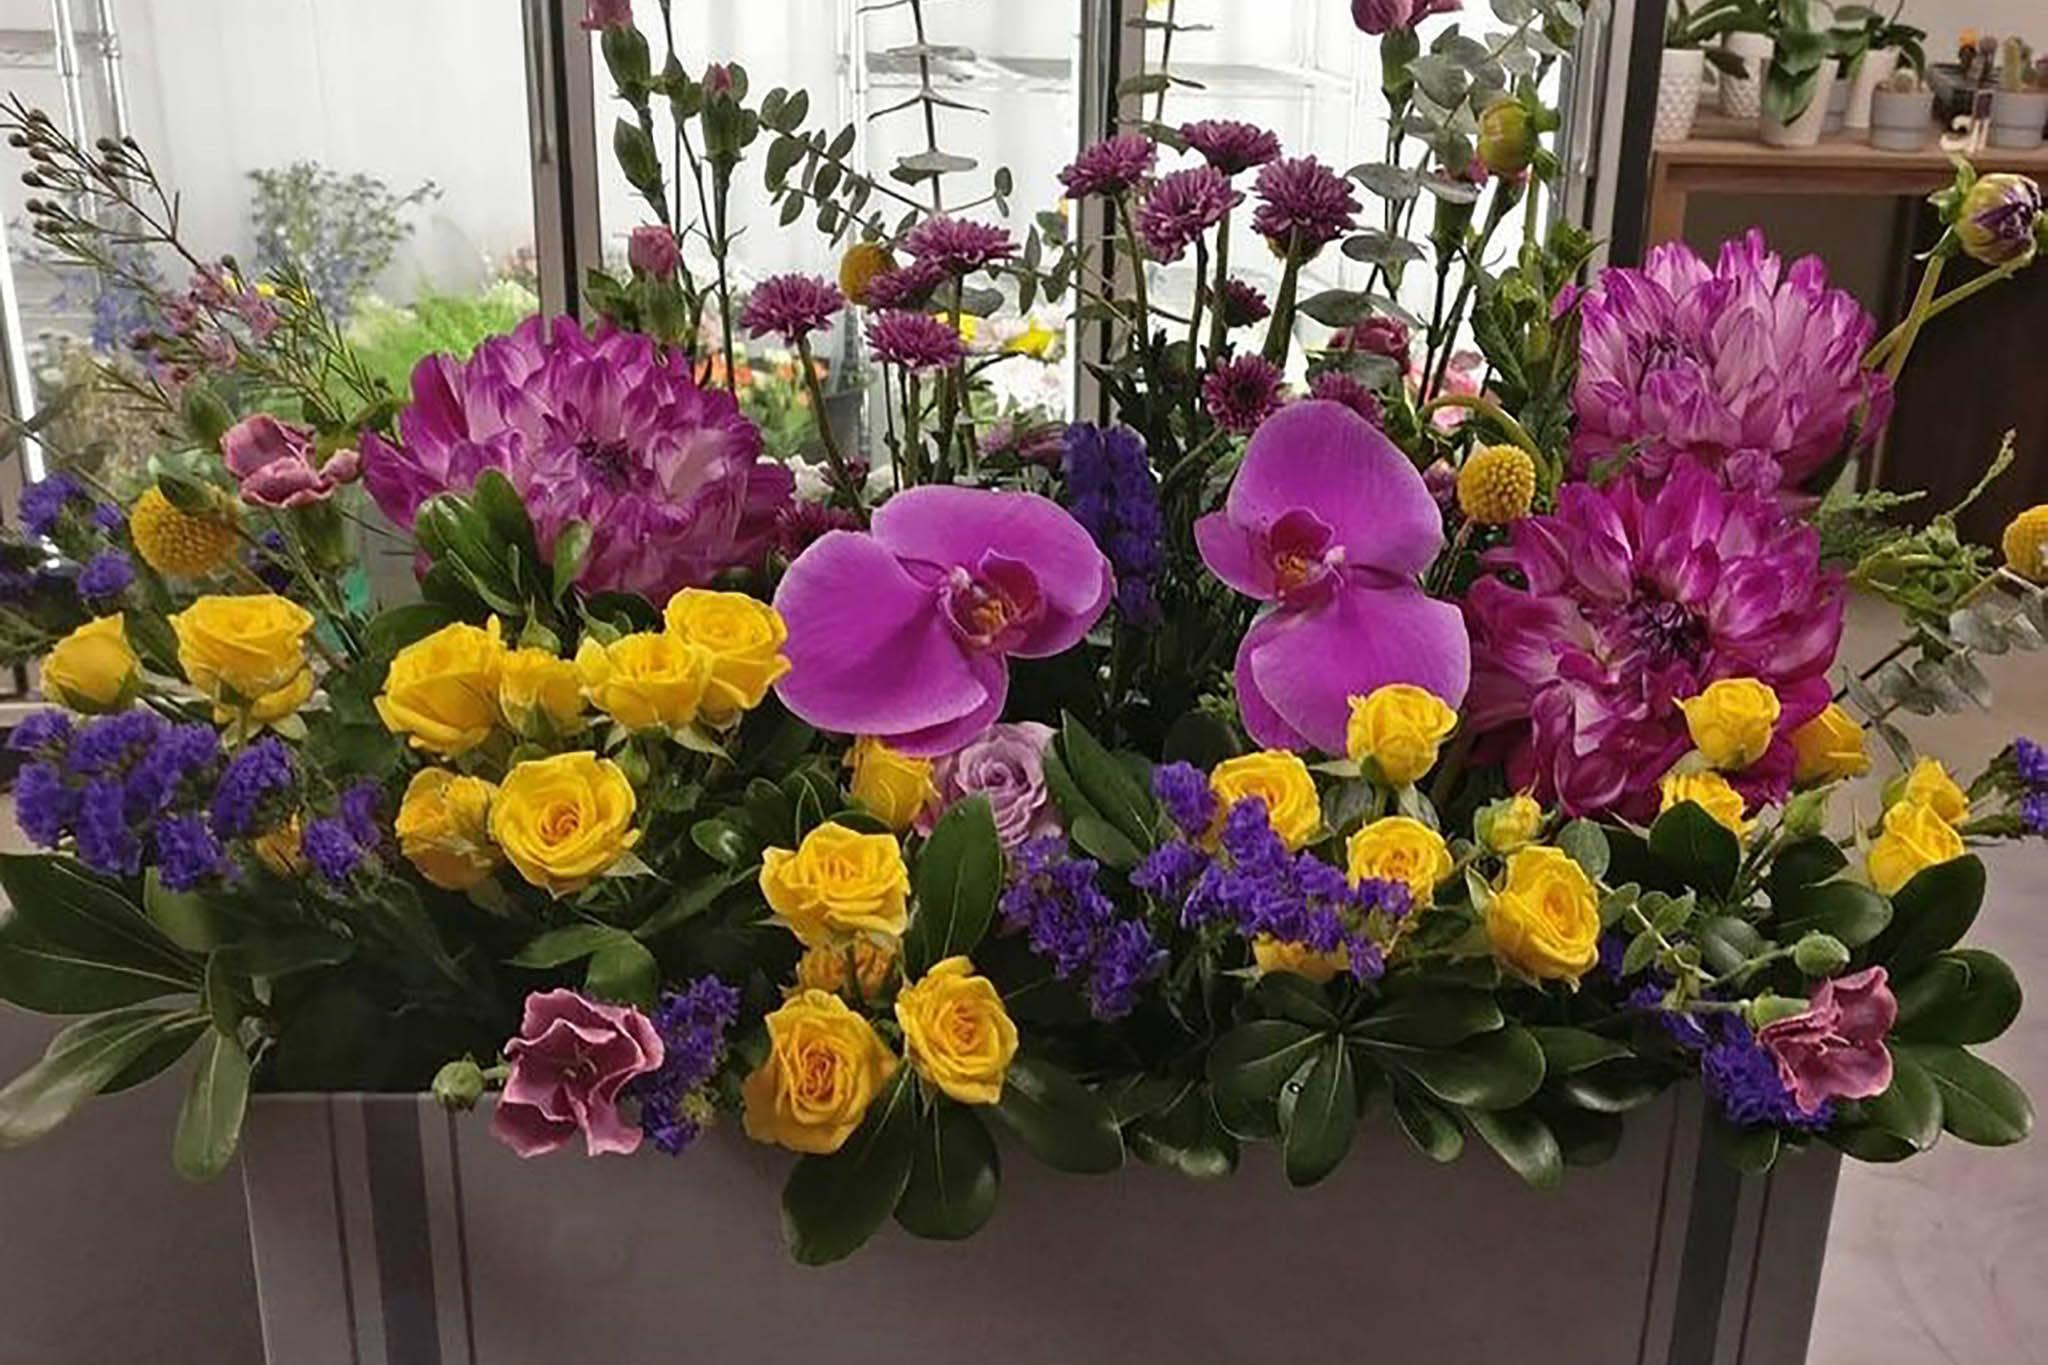 cumberland flower shop toronto